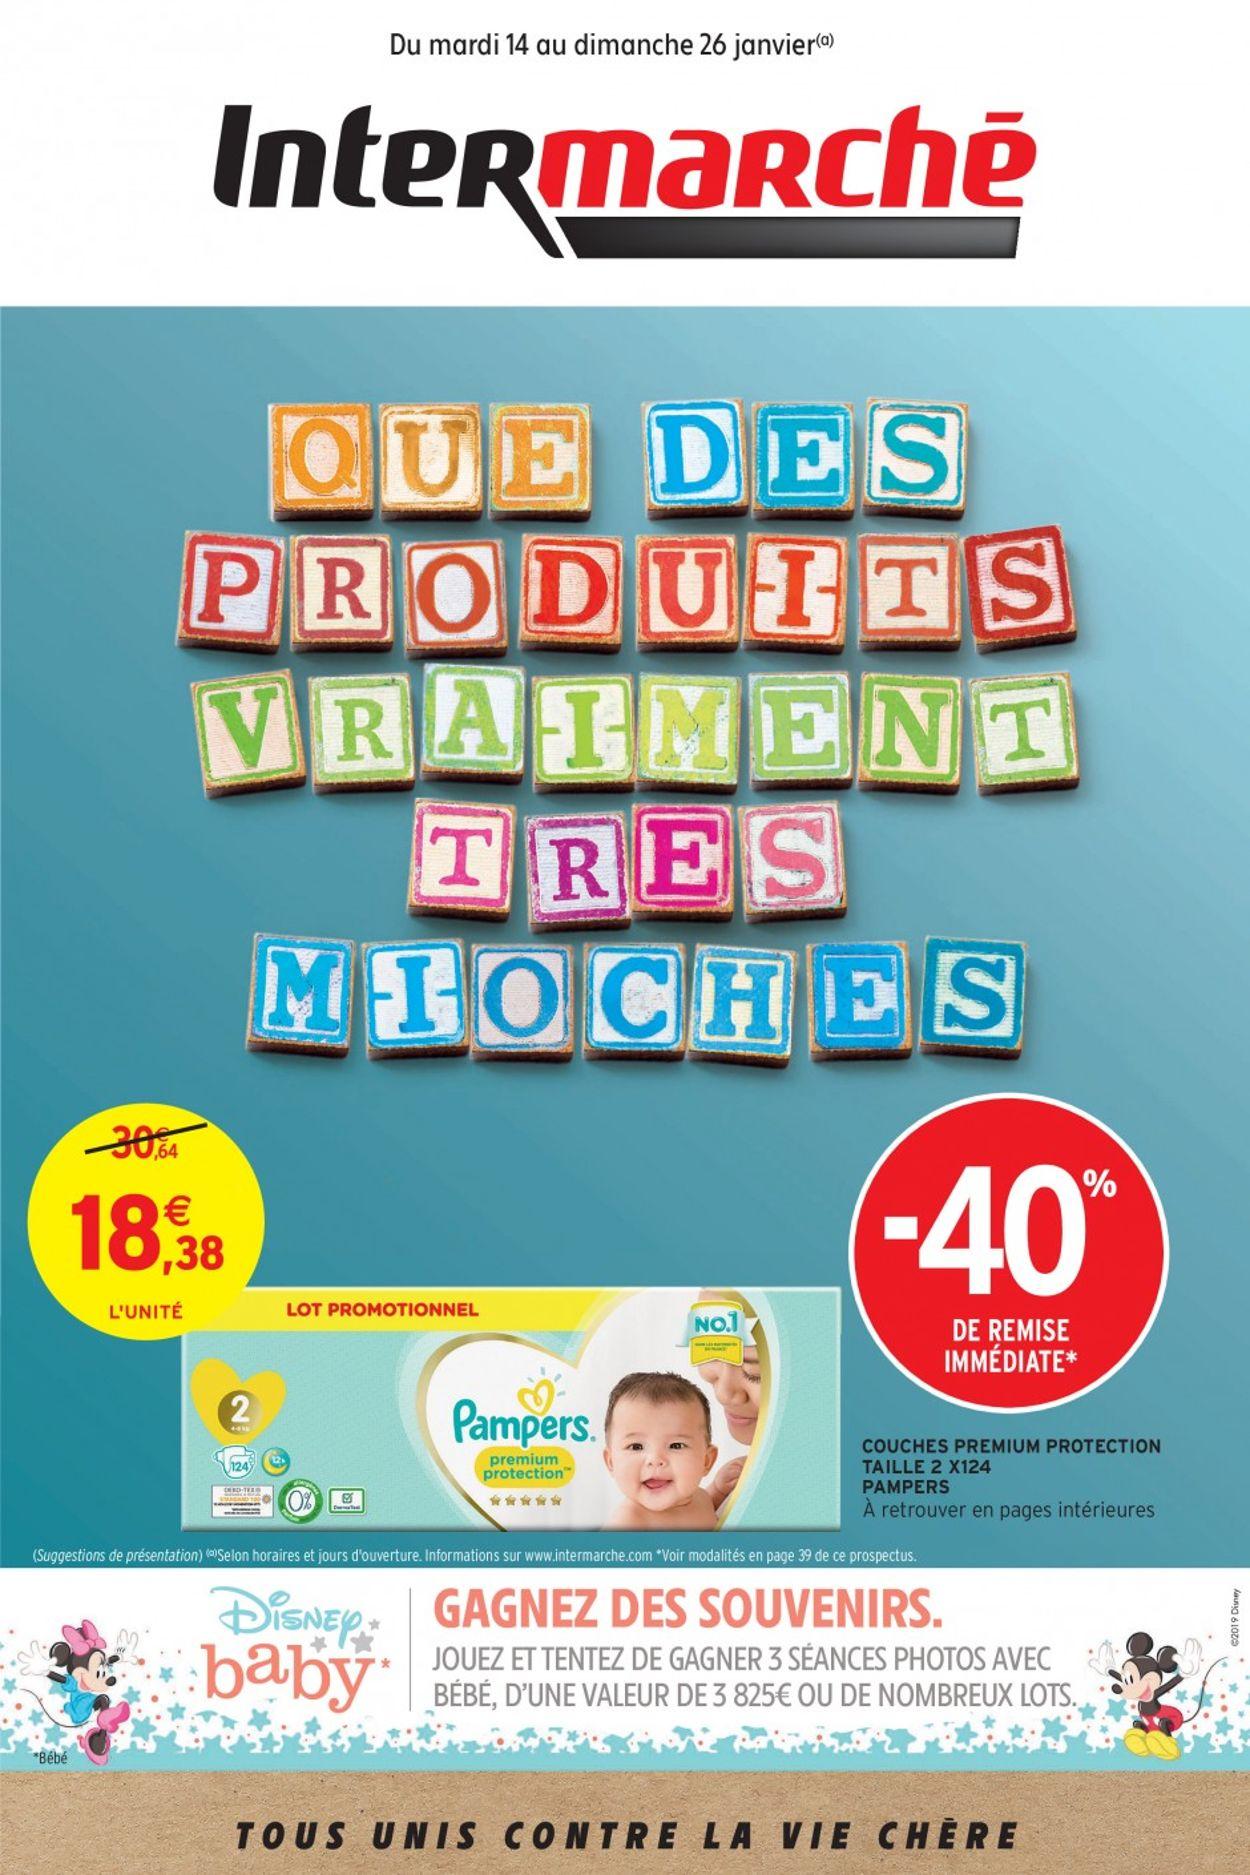 Intermarché Catalogue - 14.01-26.01.2020